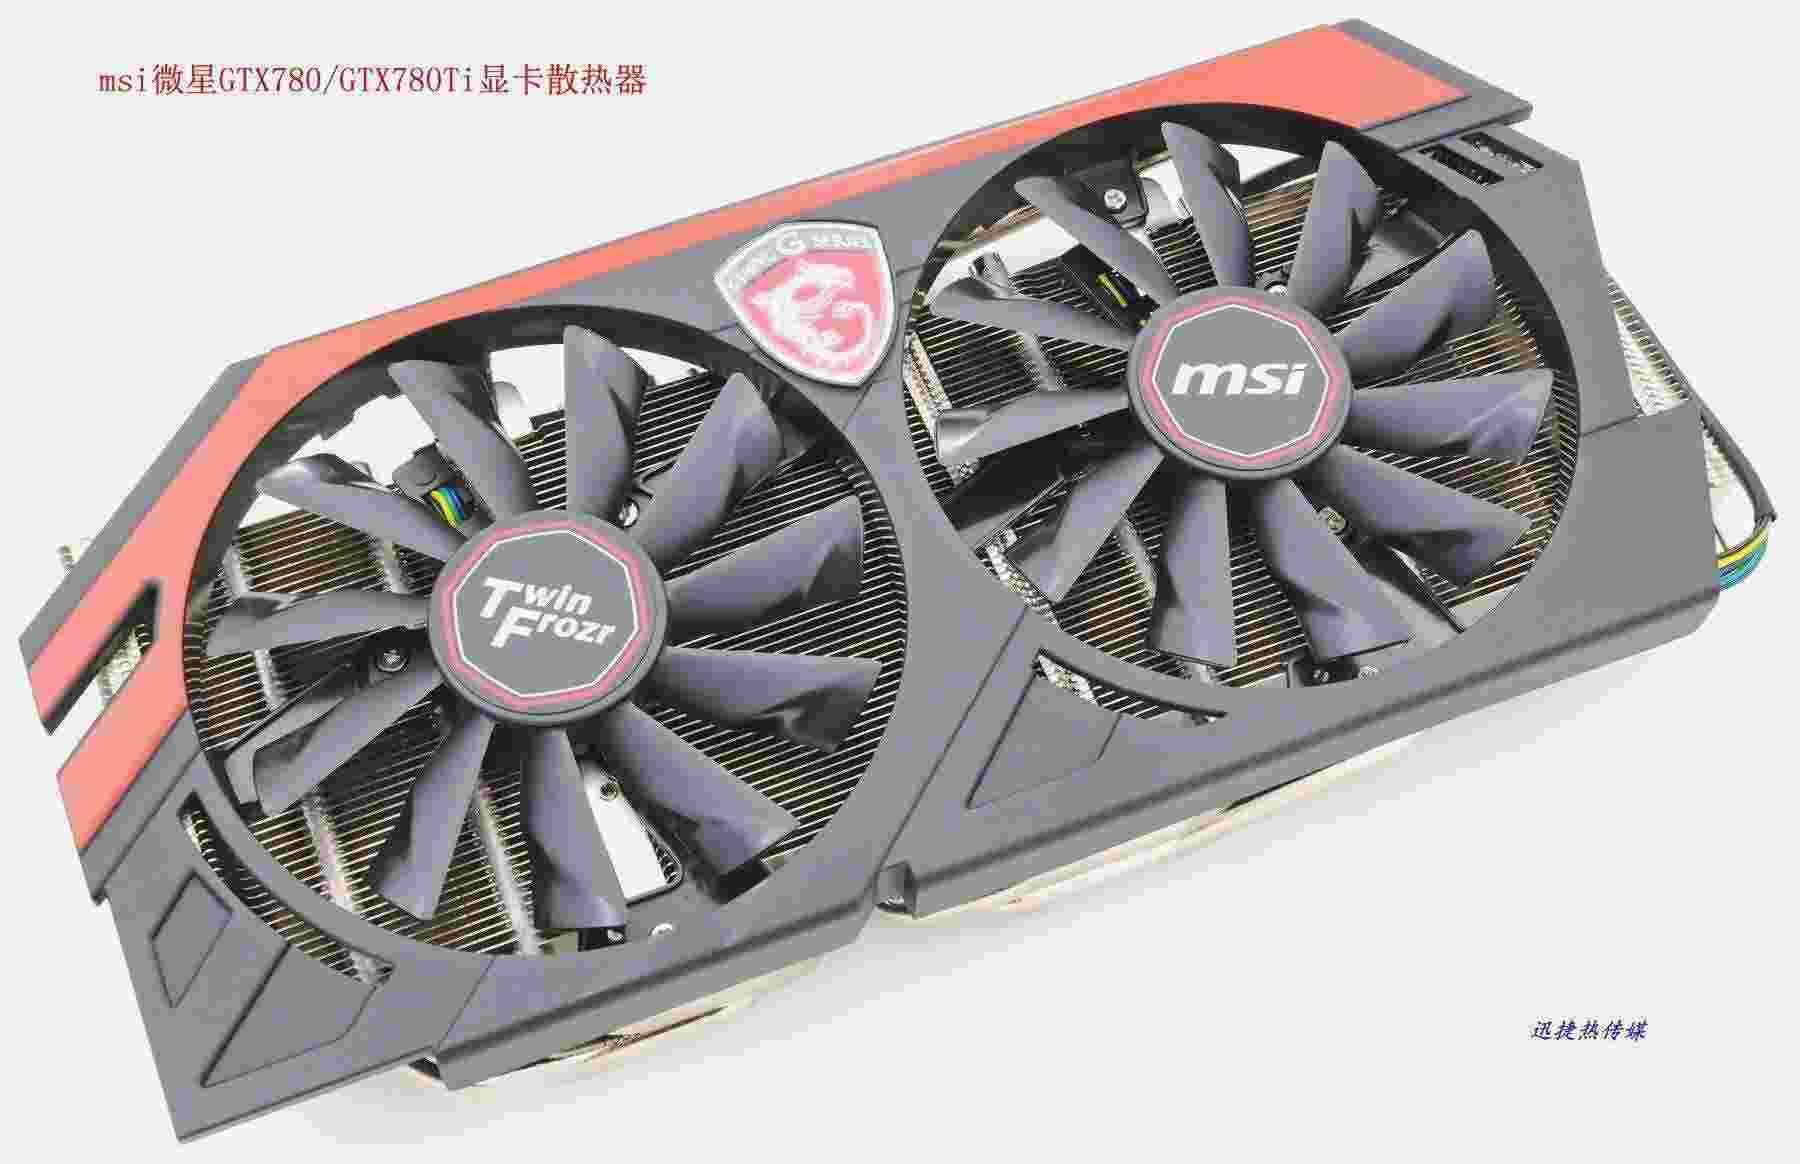 New Original For Msi Gtx780 Gtx780ti Gaming Video Card Cooling Fan Heatsink 10 X 10mm Aluminium Radiator Pendingin Heat Sink With Graphics Online 8307 Piece On Karen7804s